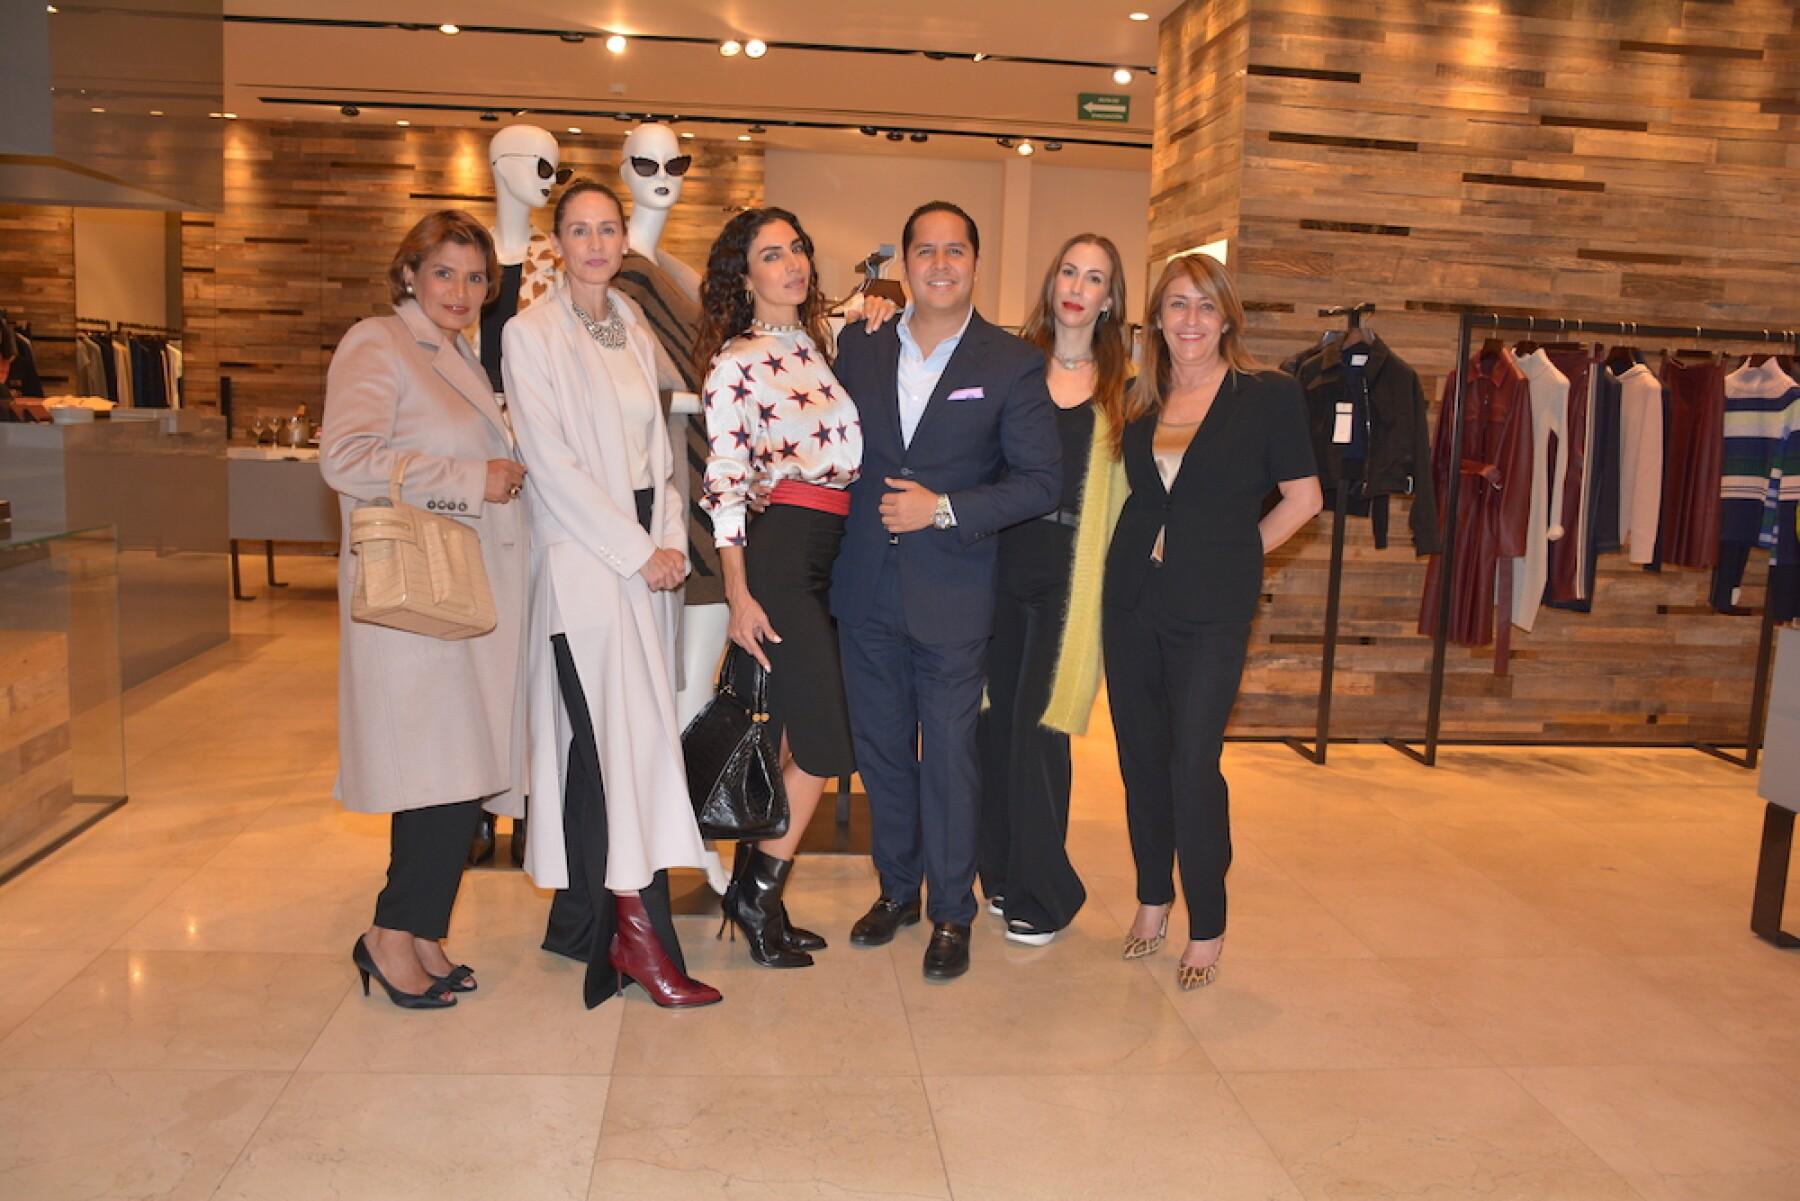 Sara Cuéllar, Karen Otero, Ivonne Marcos, Alberto Cervantes, Brenda Jaet y Francesca Tinghi.